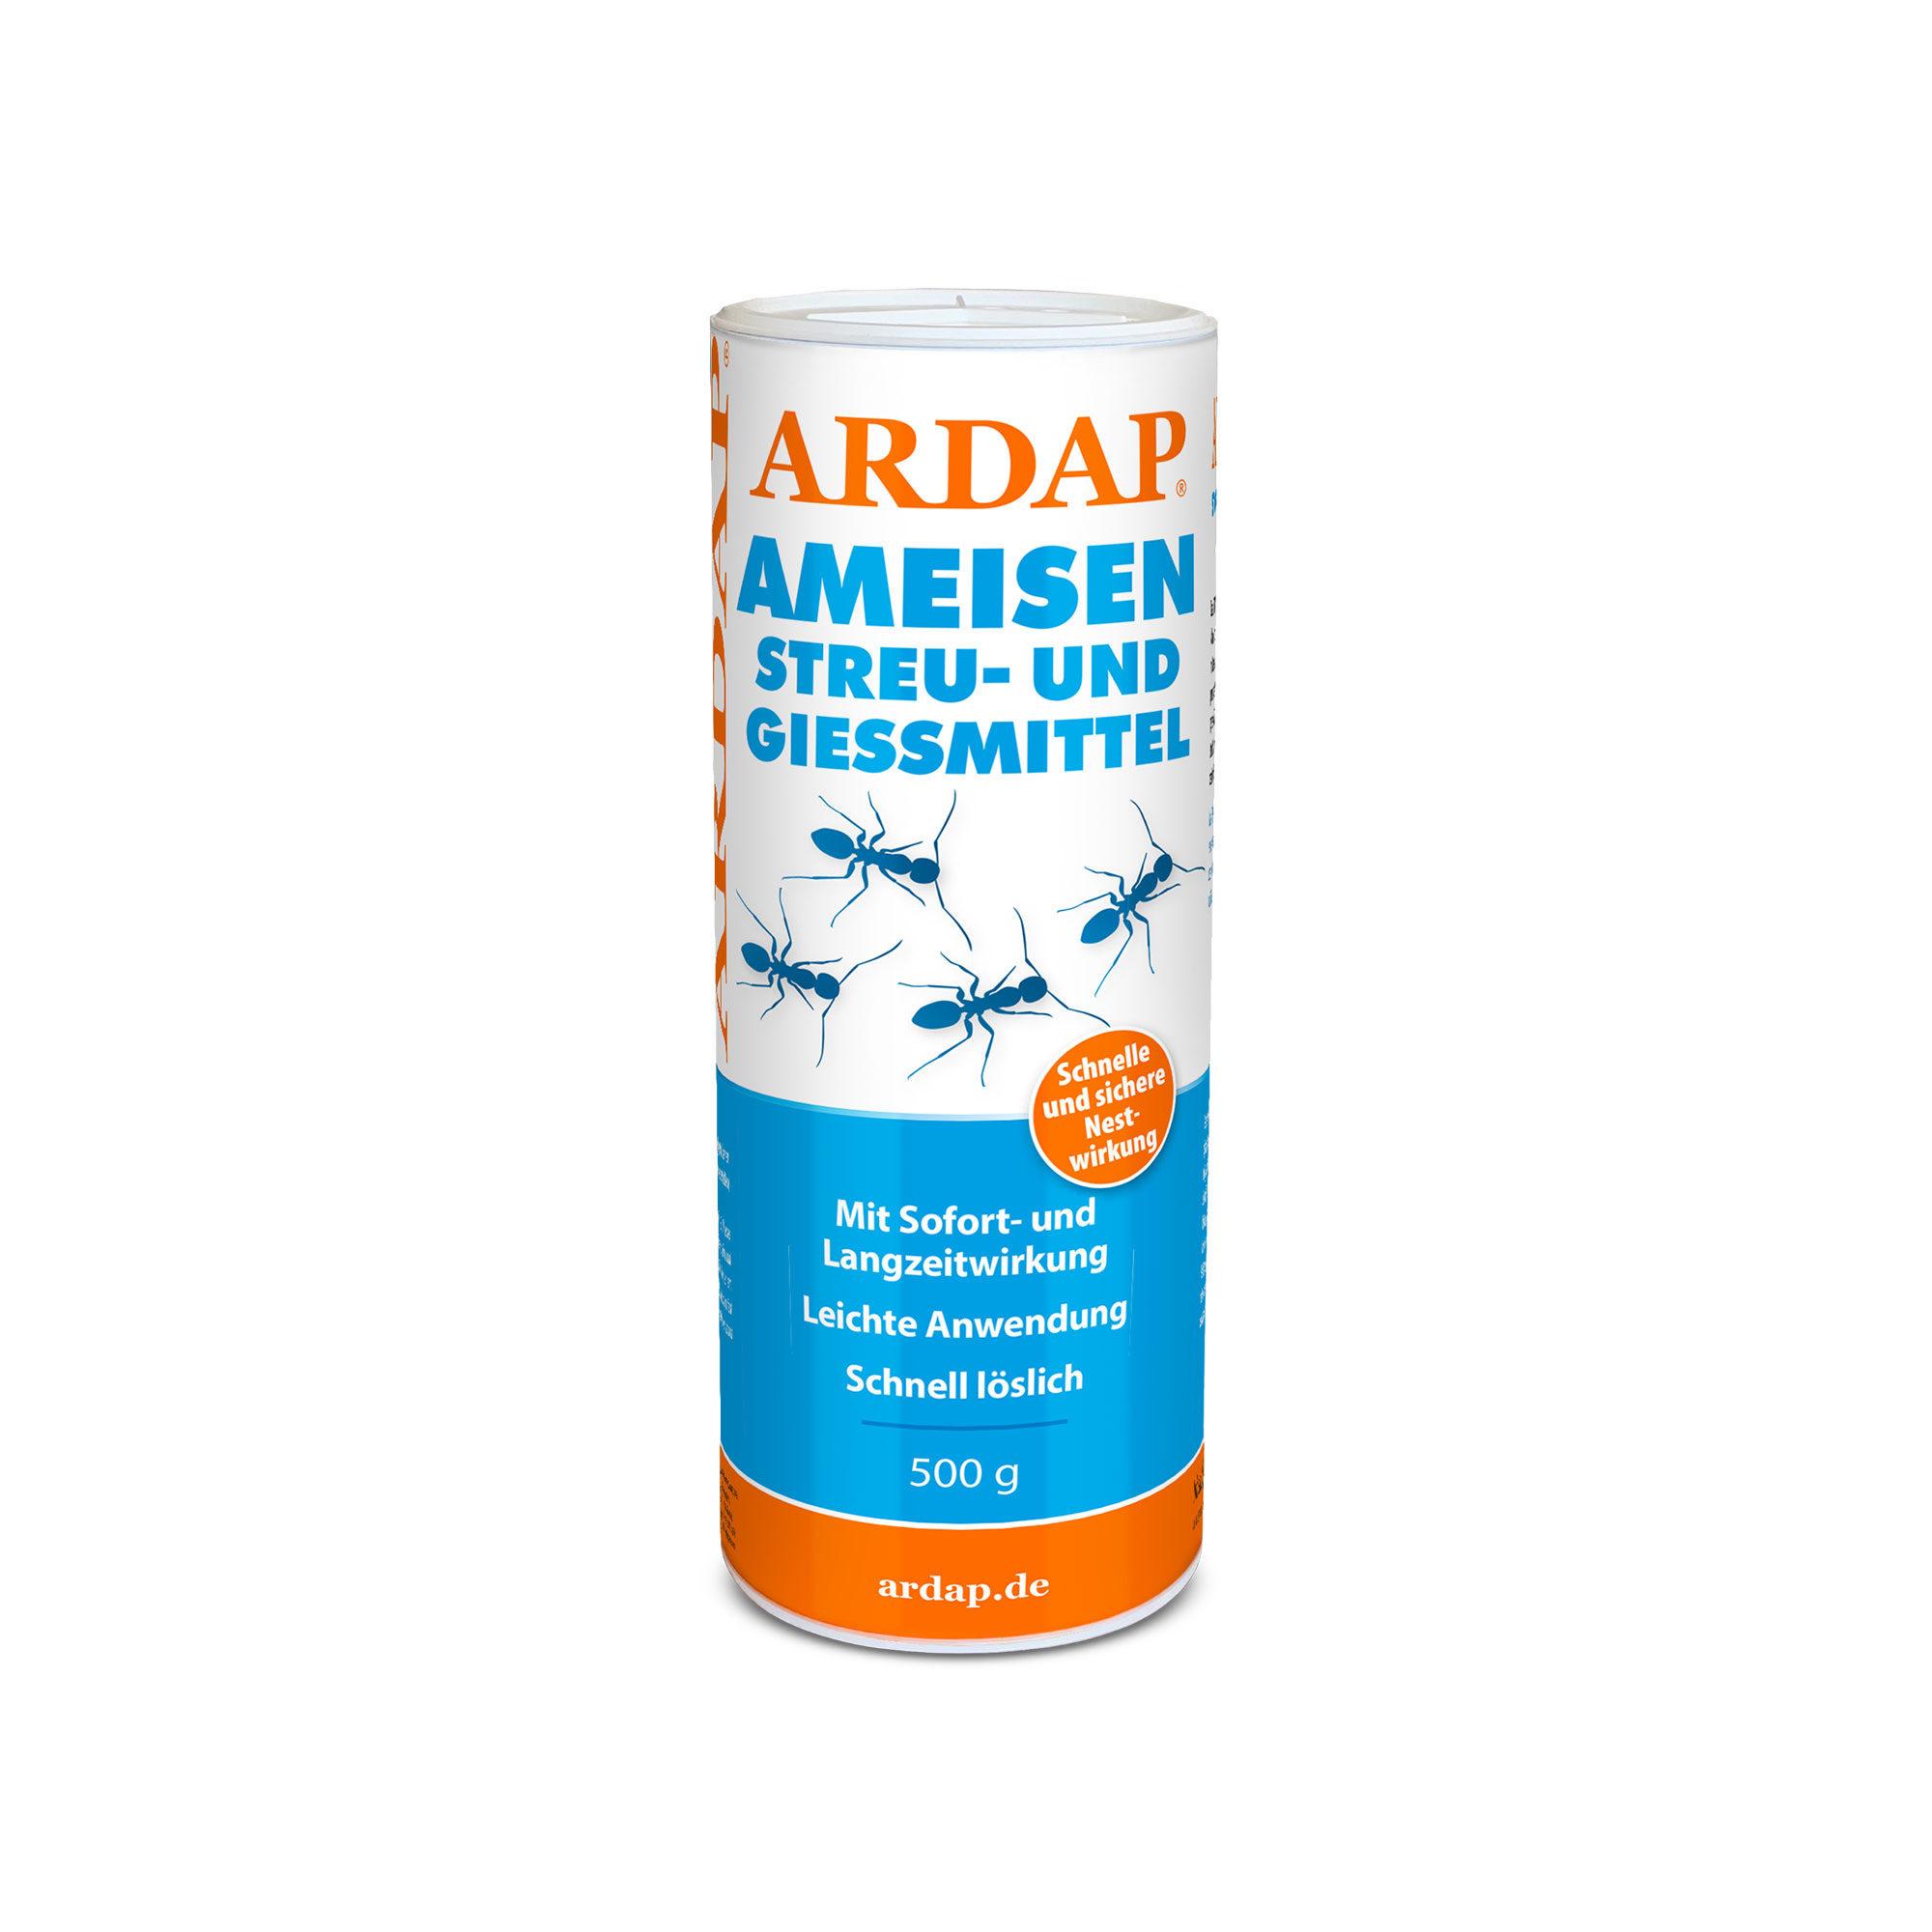 Ardap Ameisen Streu- & Gießmittel - 500 g